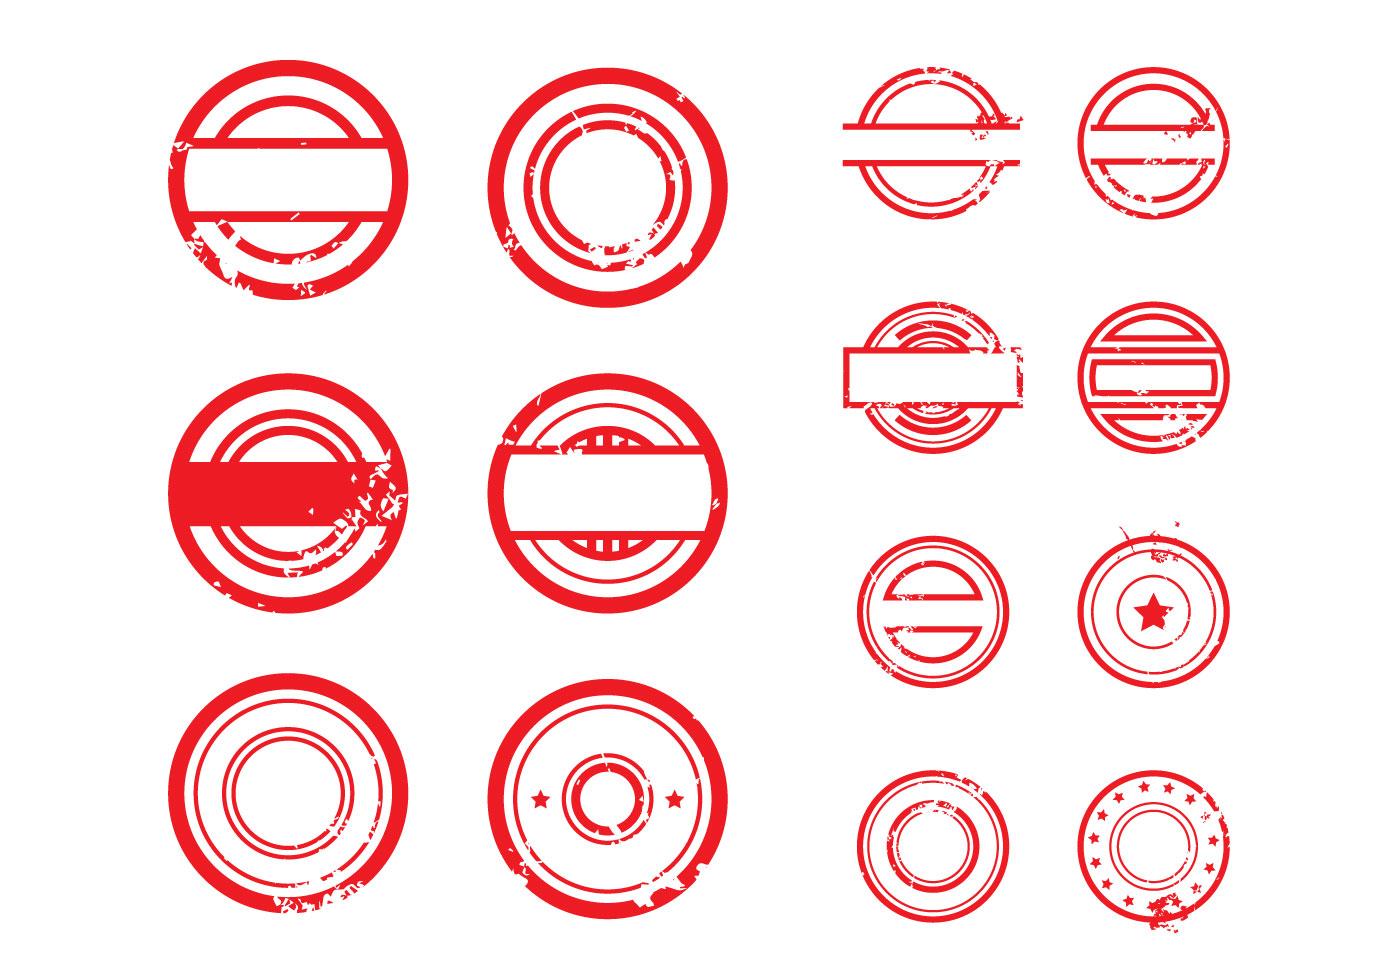 Free Stempel Vector Illustration 1 Download Free Vector